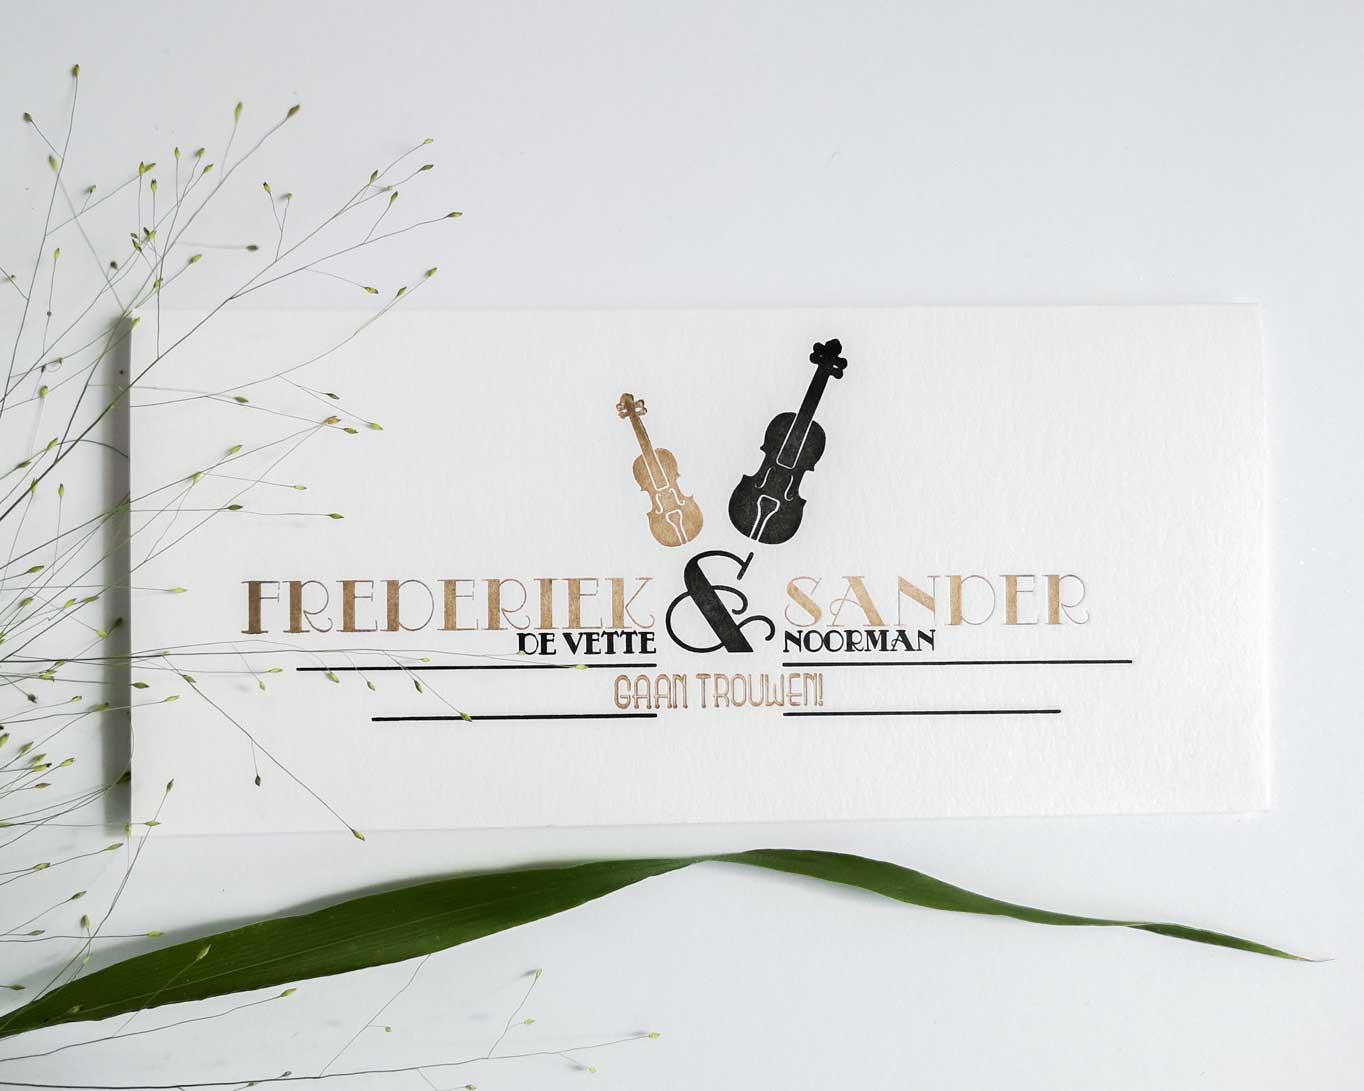 Trouwkaart Frederiek & Sander in goud en zwart gedrukt.